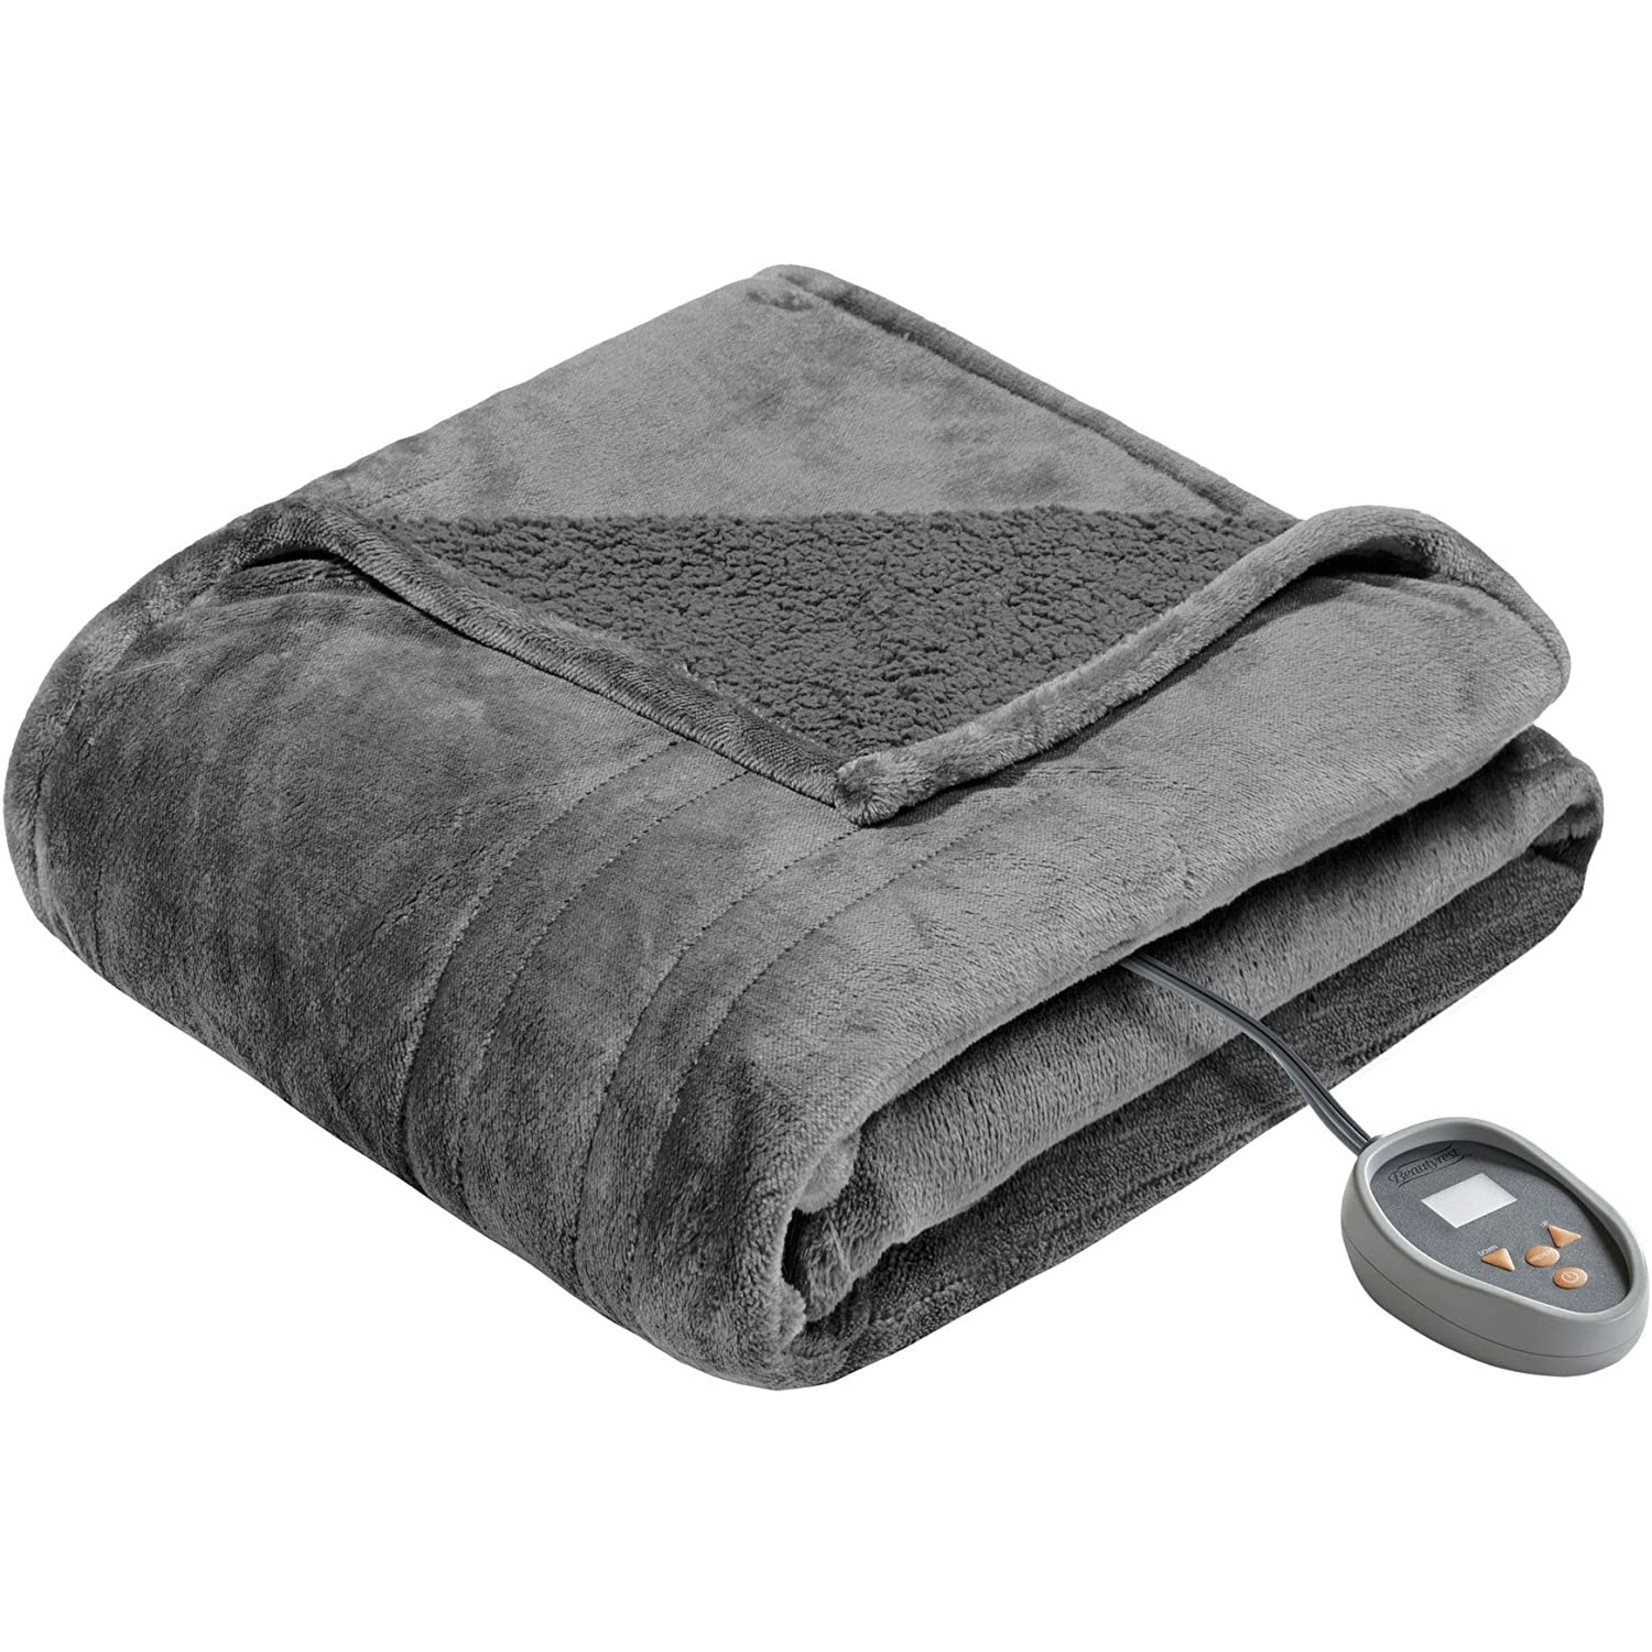 *Full - Heated Plush Blanket - Final Sale